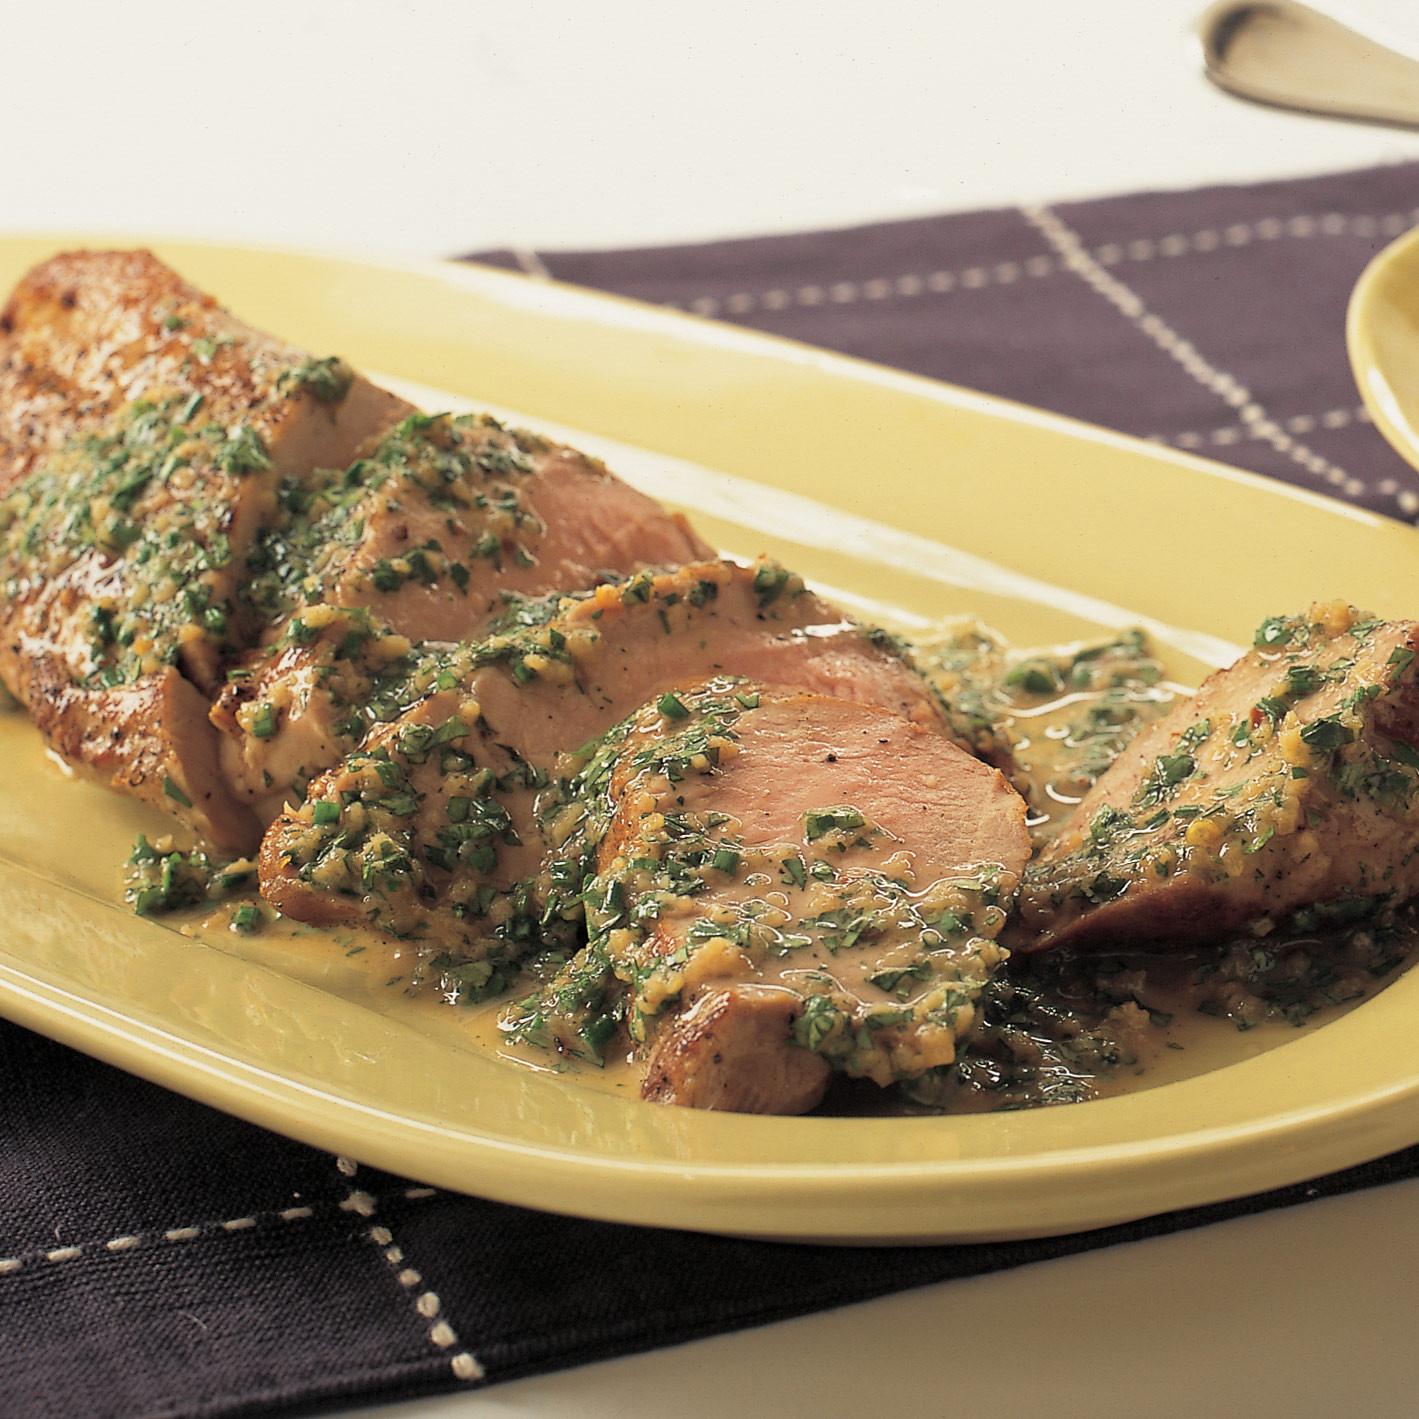 Oven Roasted Pork Tenderloin  Pan Seared Oven Roasted Pork Tenderloins